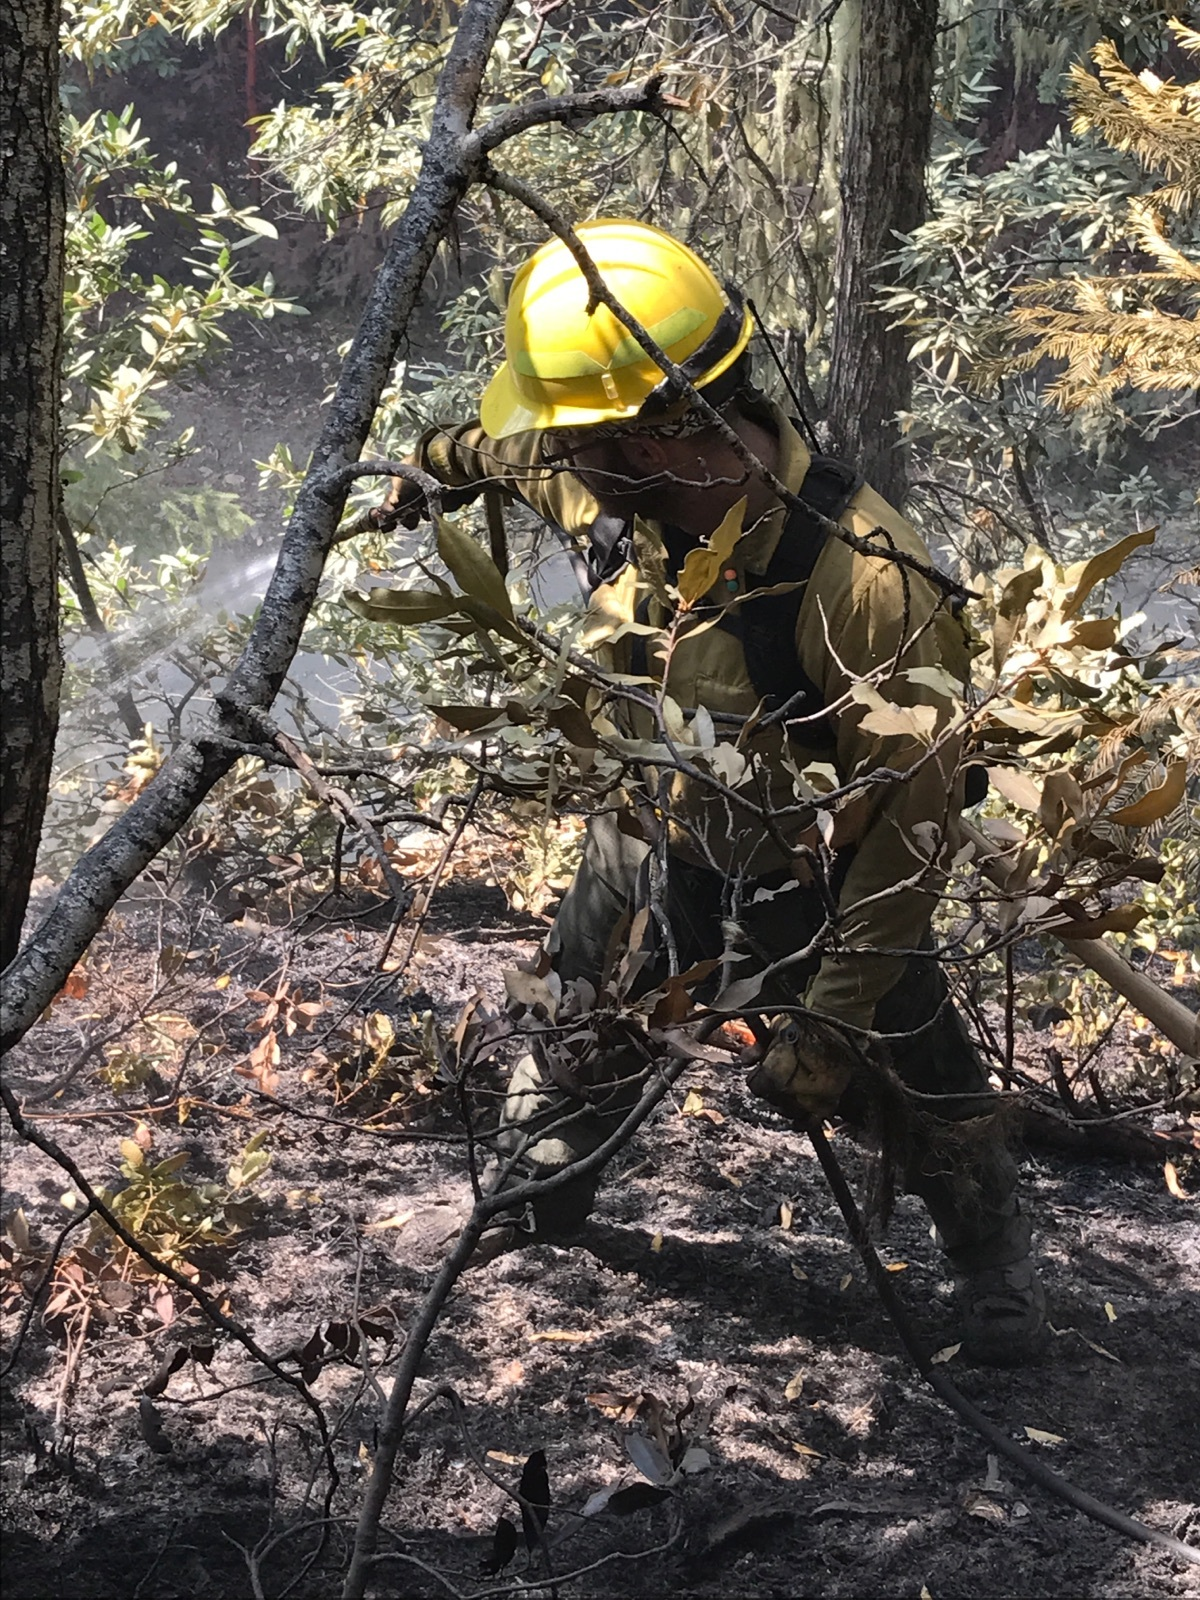 Treasure Valley Fire Wildland Firefighting Services